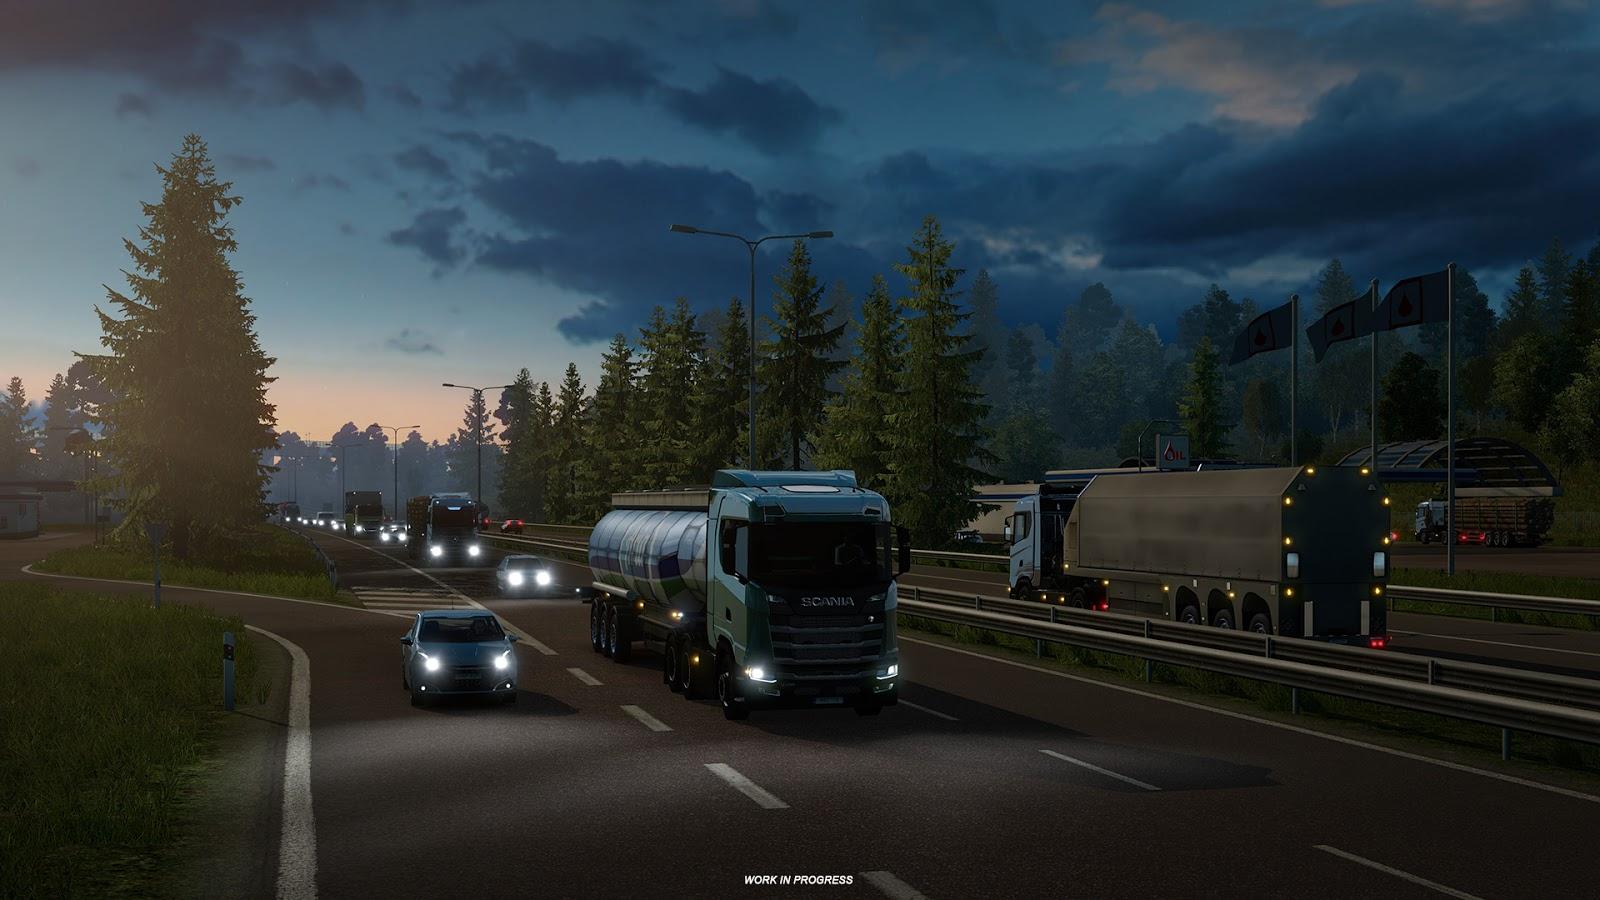 euro truck simulator 2 - game update v.1.32.3.14 - download